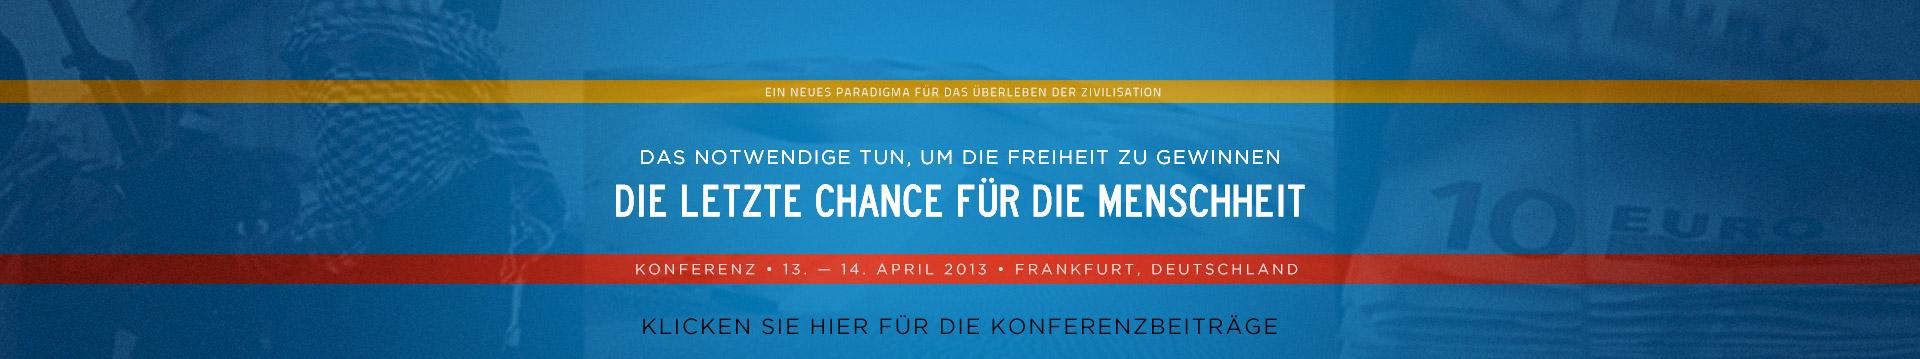 Konferenz bei Frankfurt, April 2013